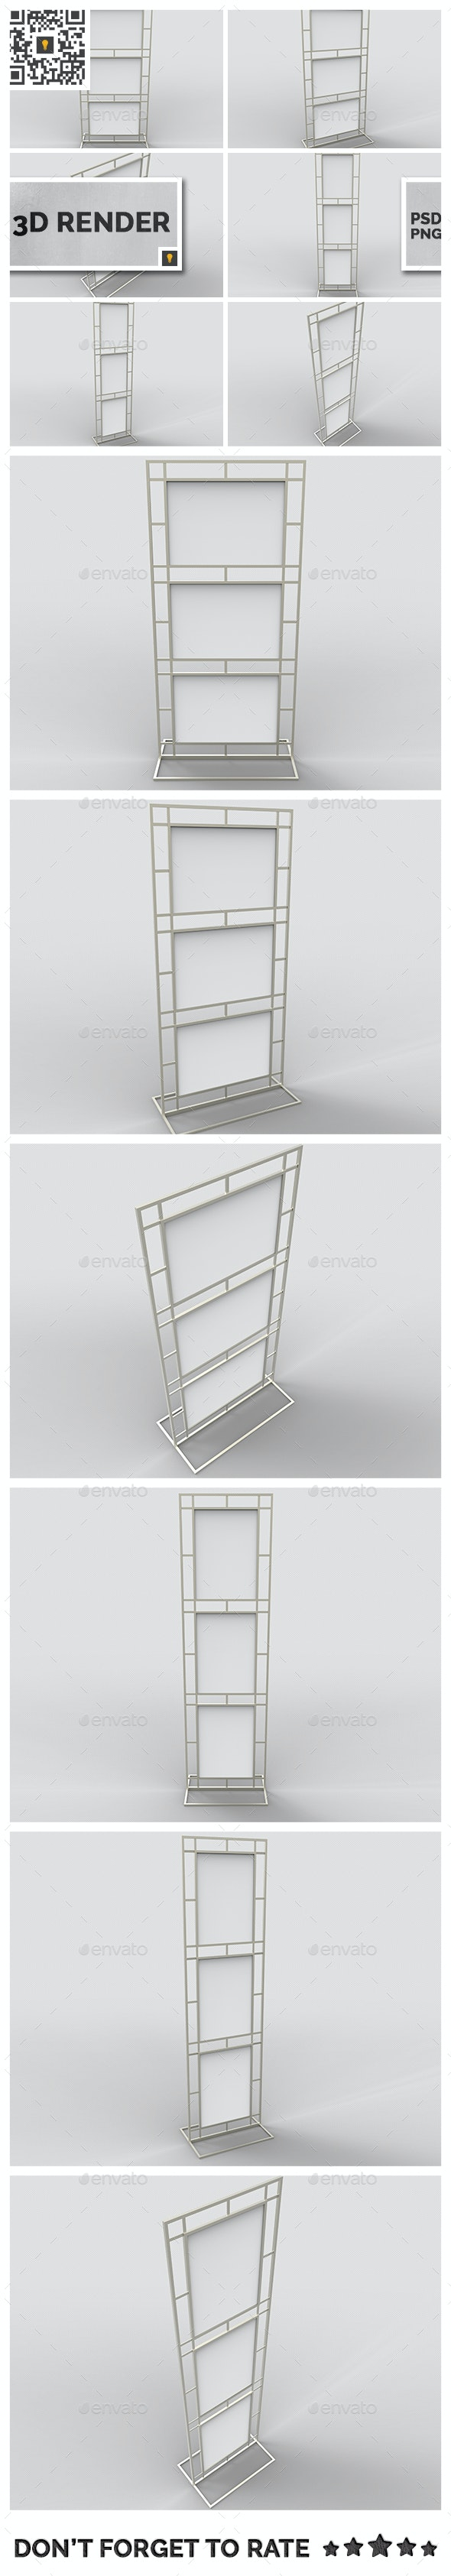 Poster Stand Display 3D Render - 3D Renders Graphics